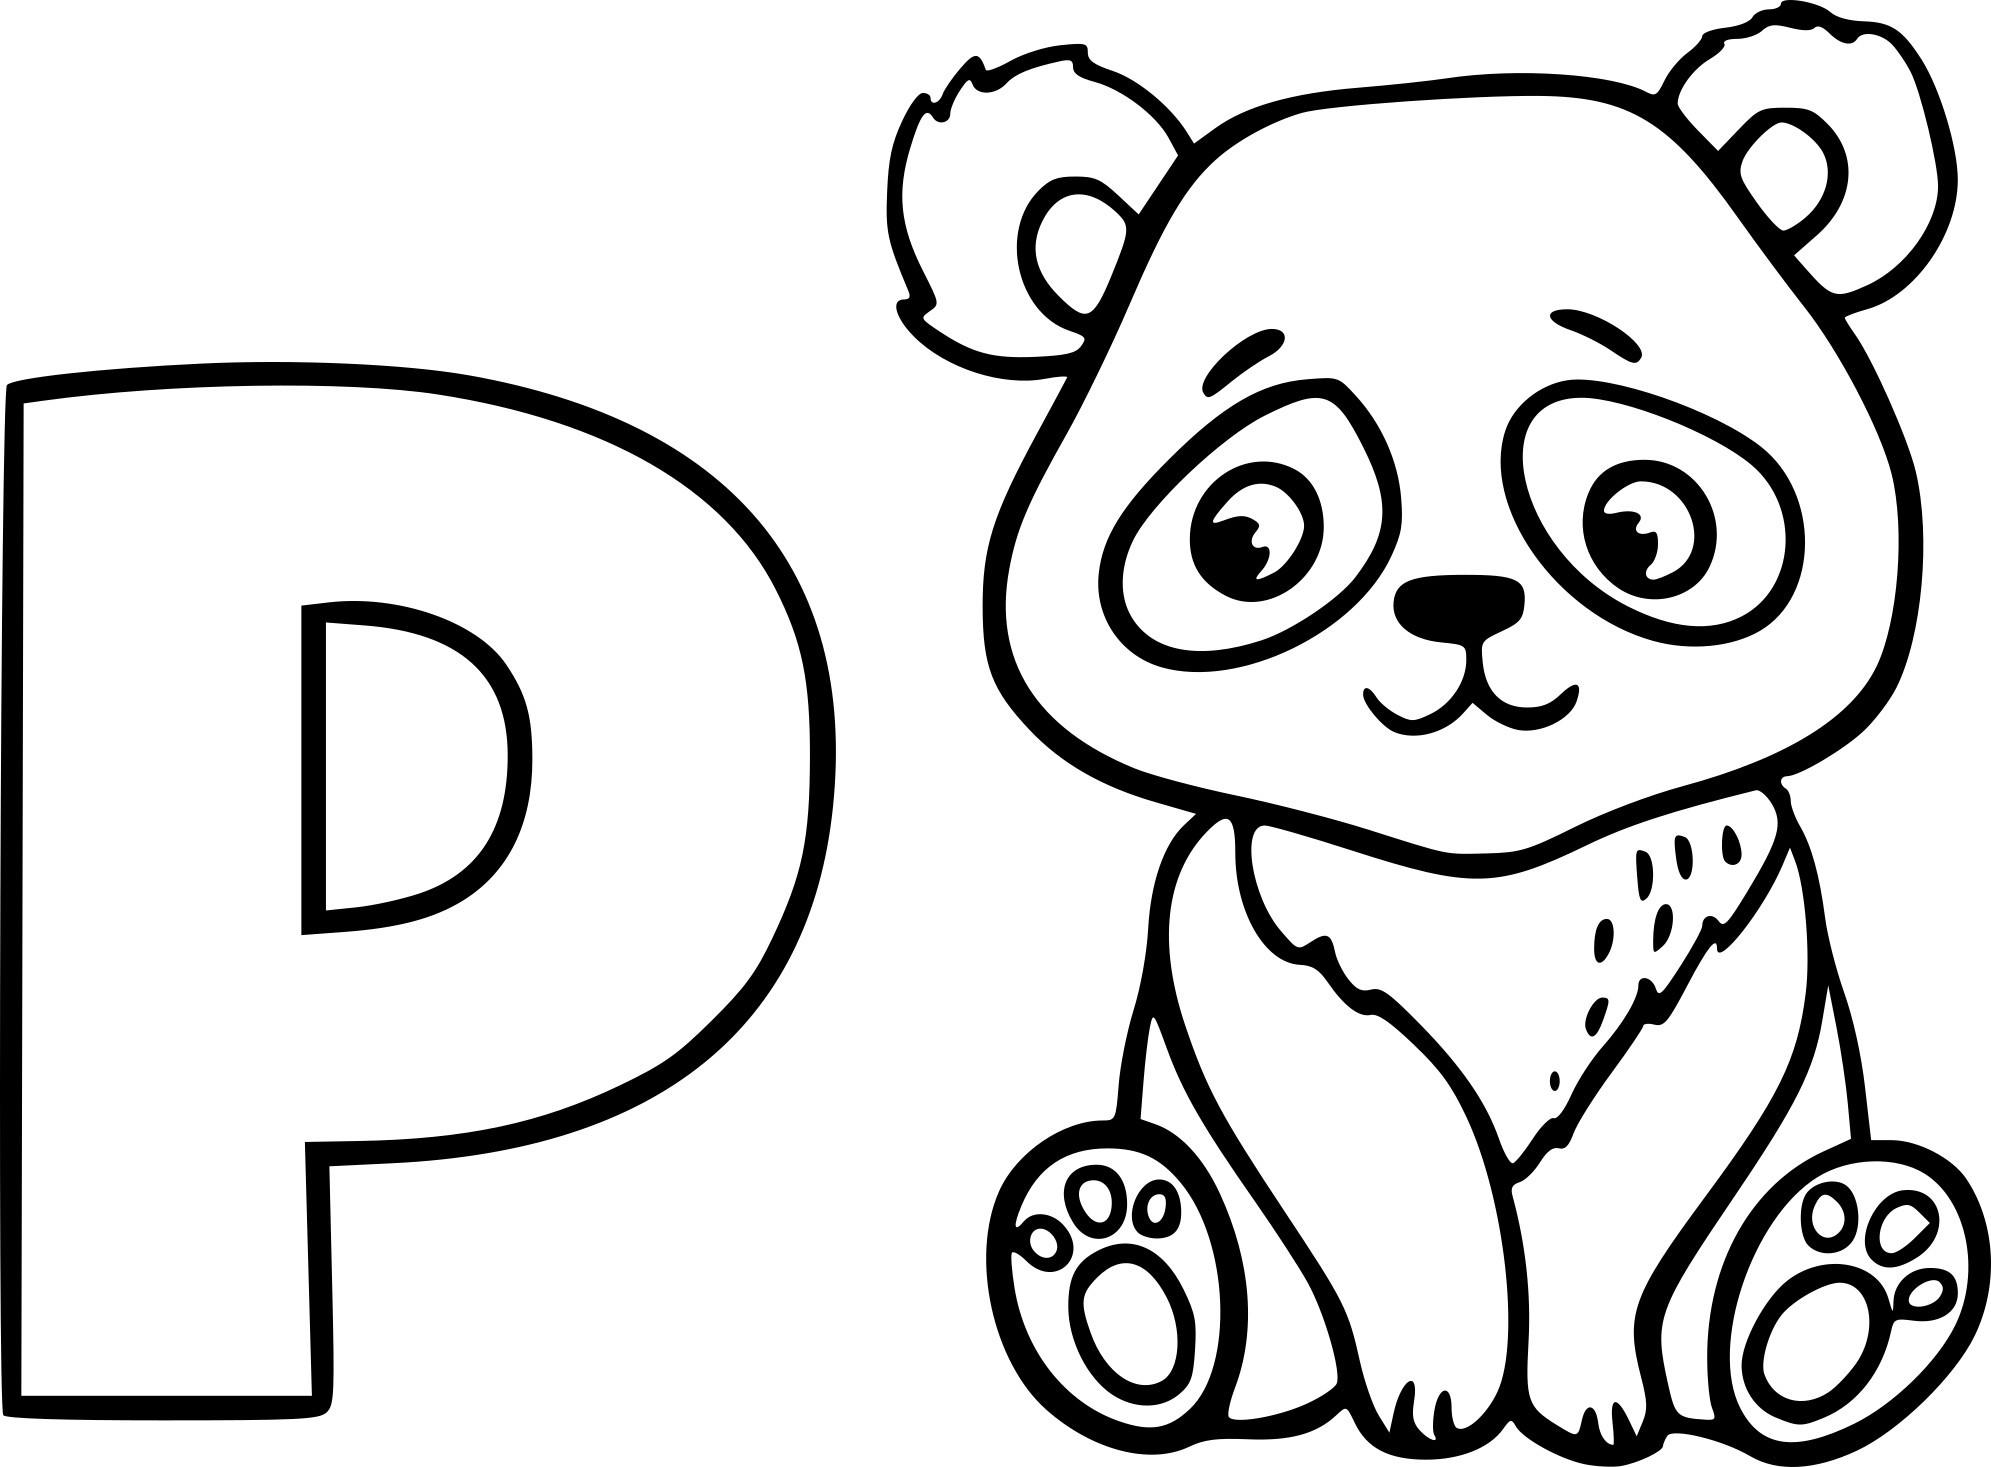 Coloriages A Imprimer Panda Numero 14839472